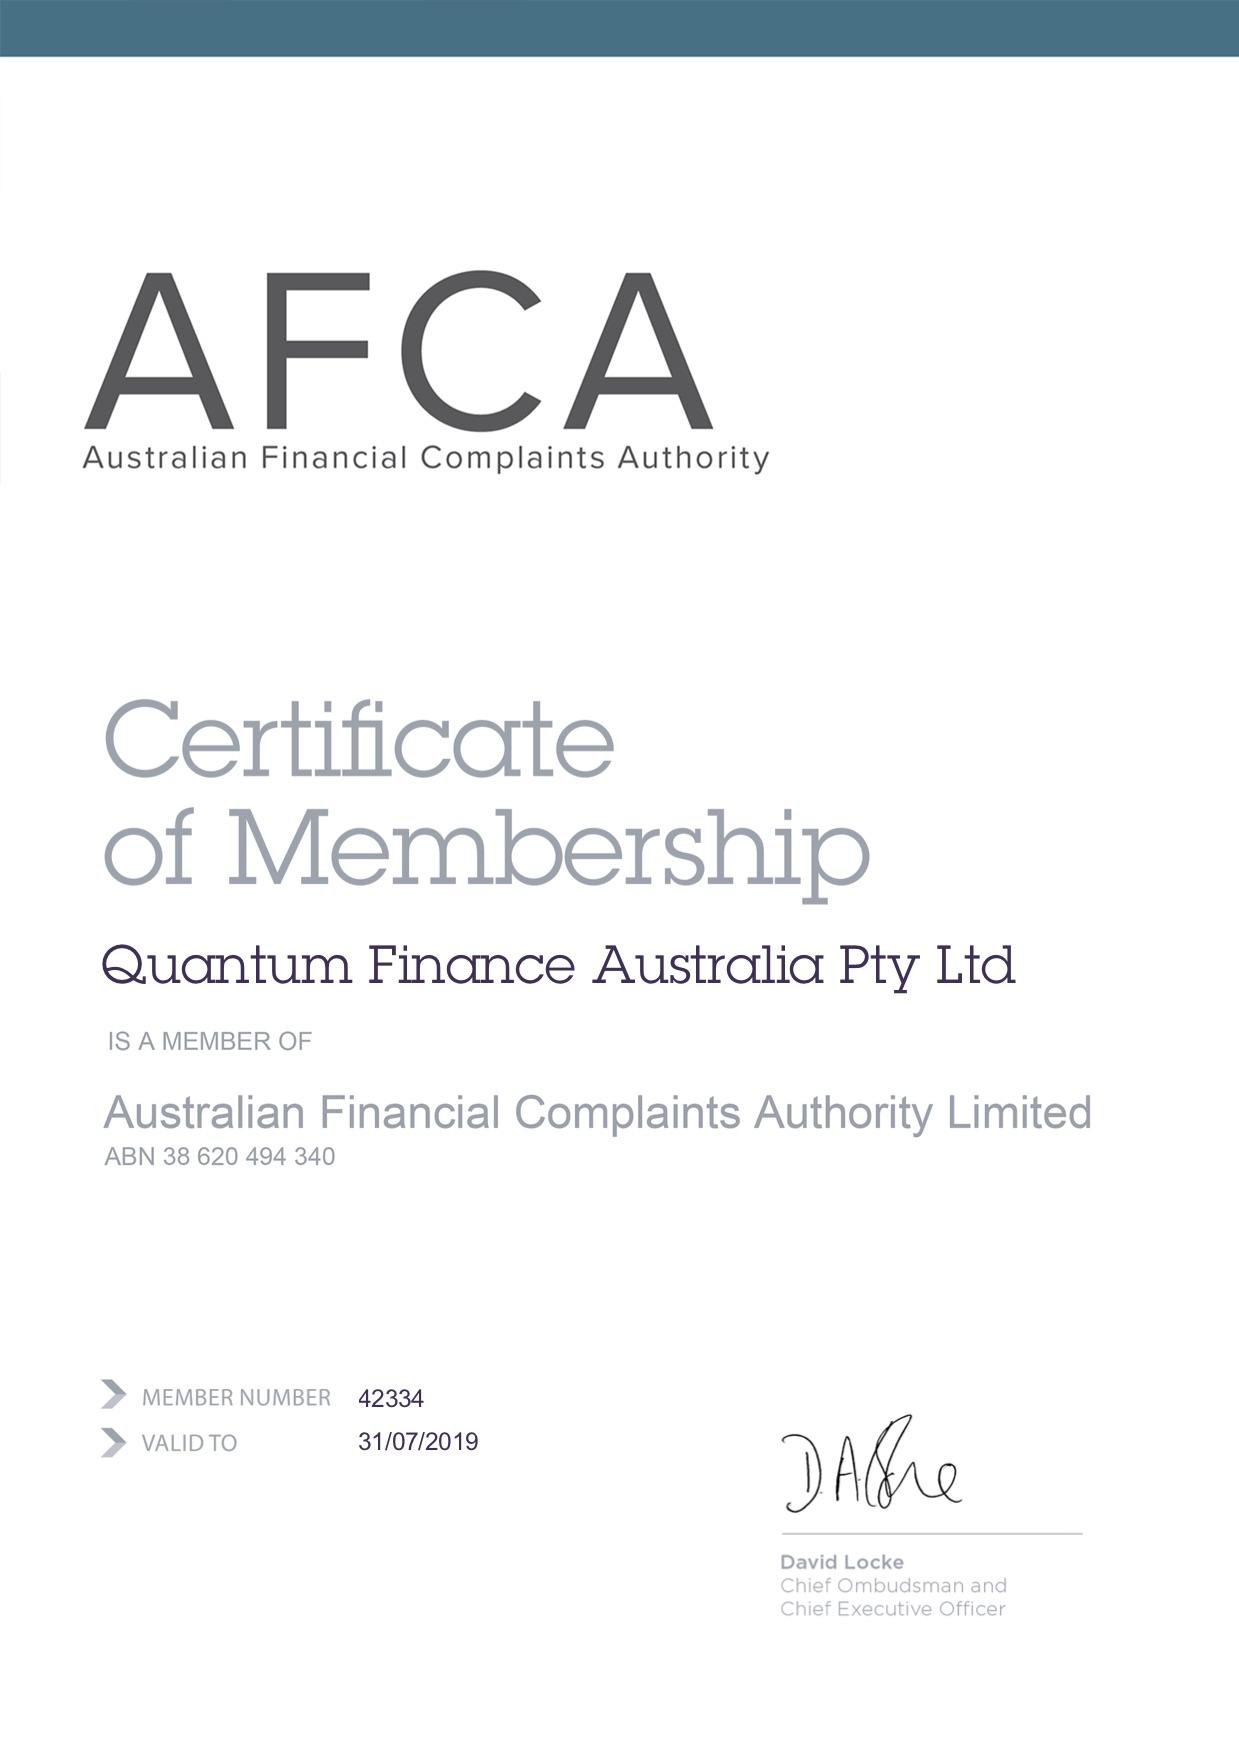 Gavin Harrigan is a member of the Australian financial complaints authority